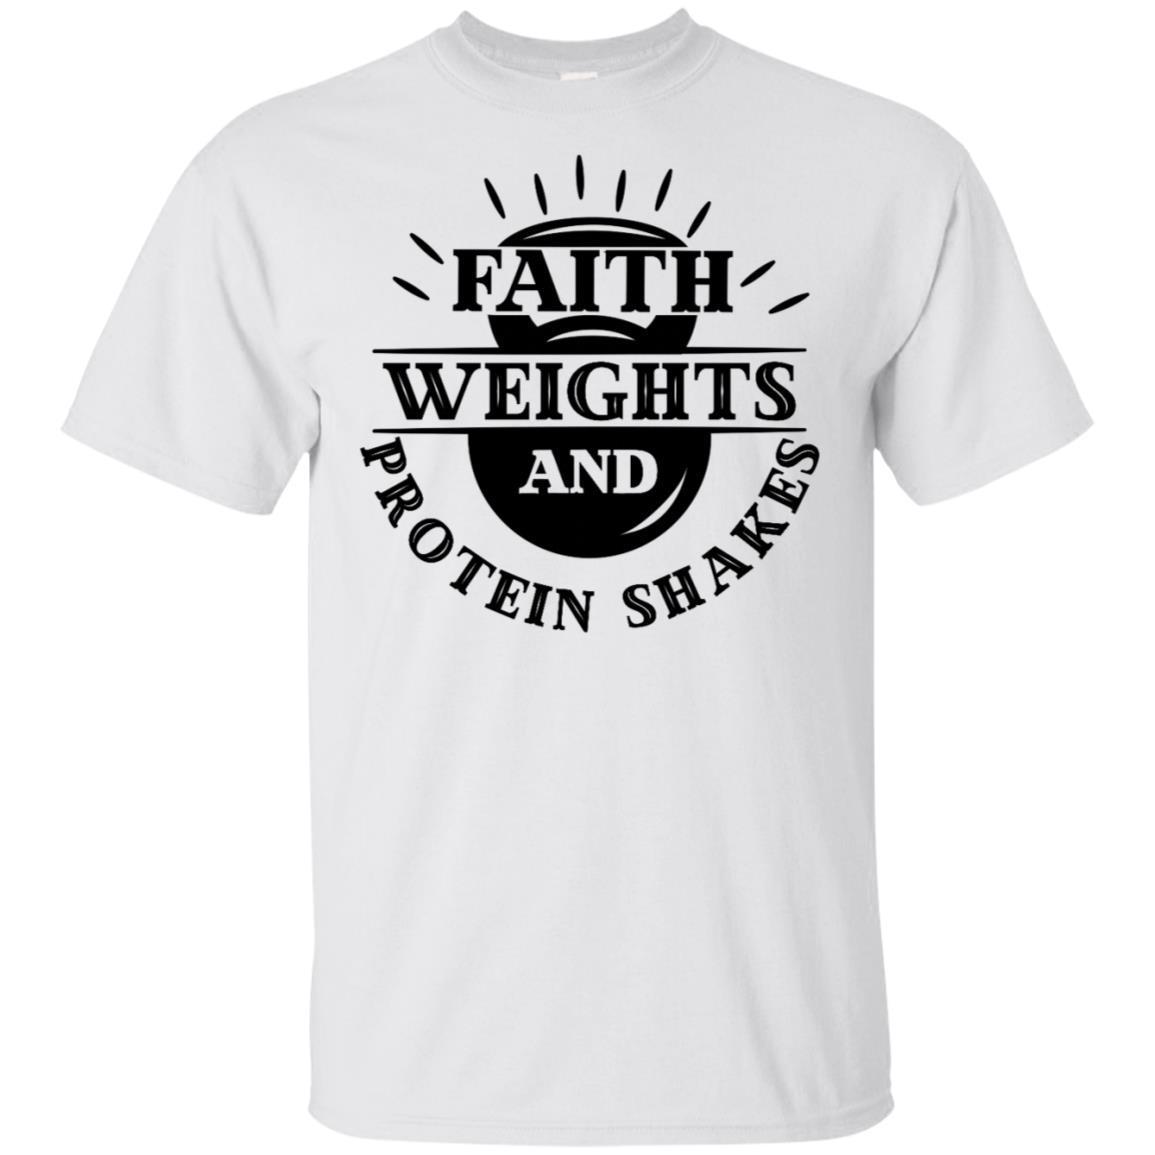 Christian Fitness Faith Weights Protein-1 Unisex Short Sleeve